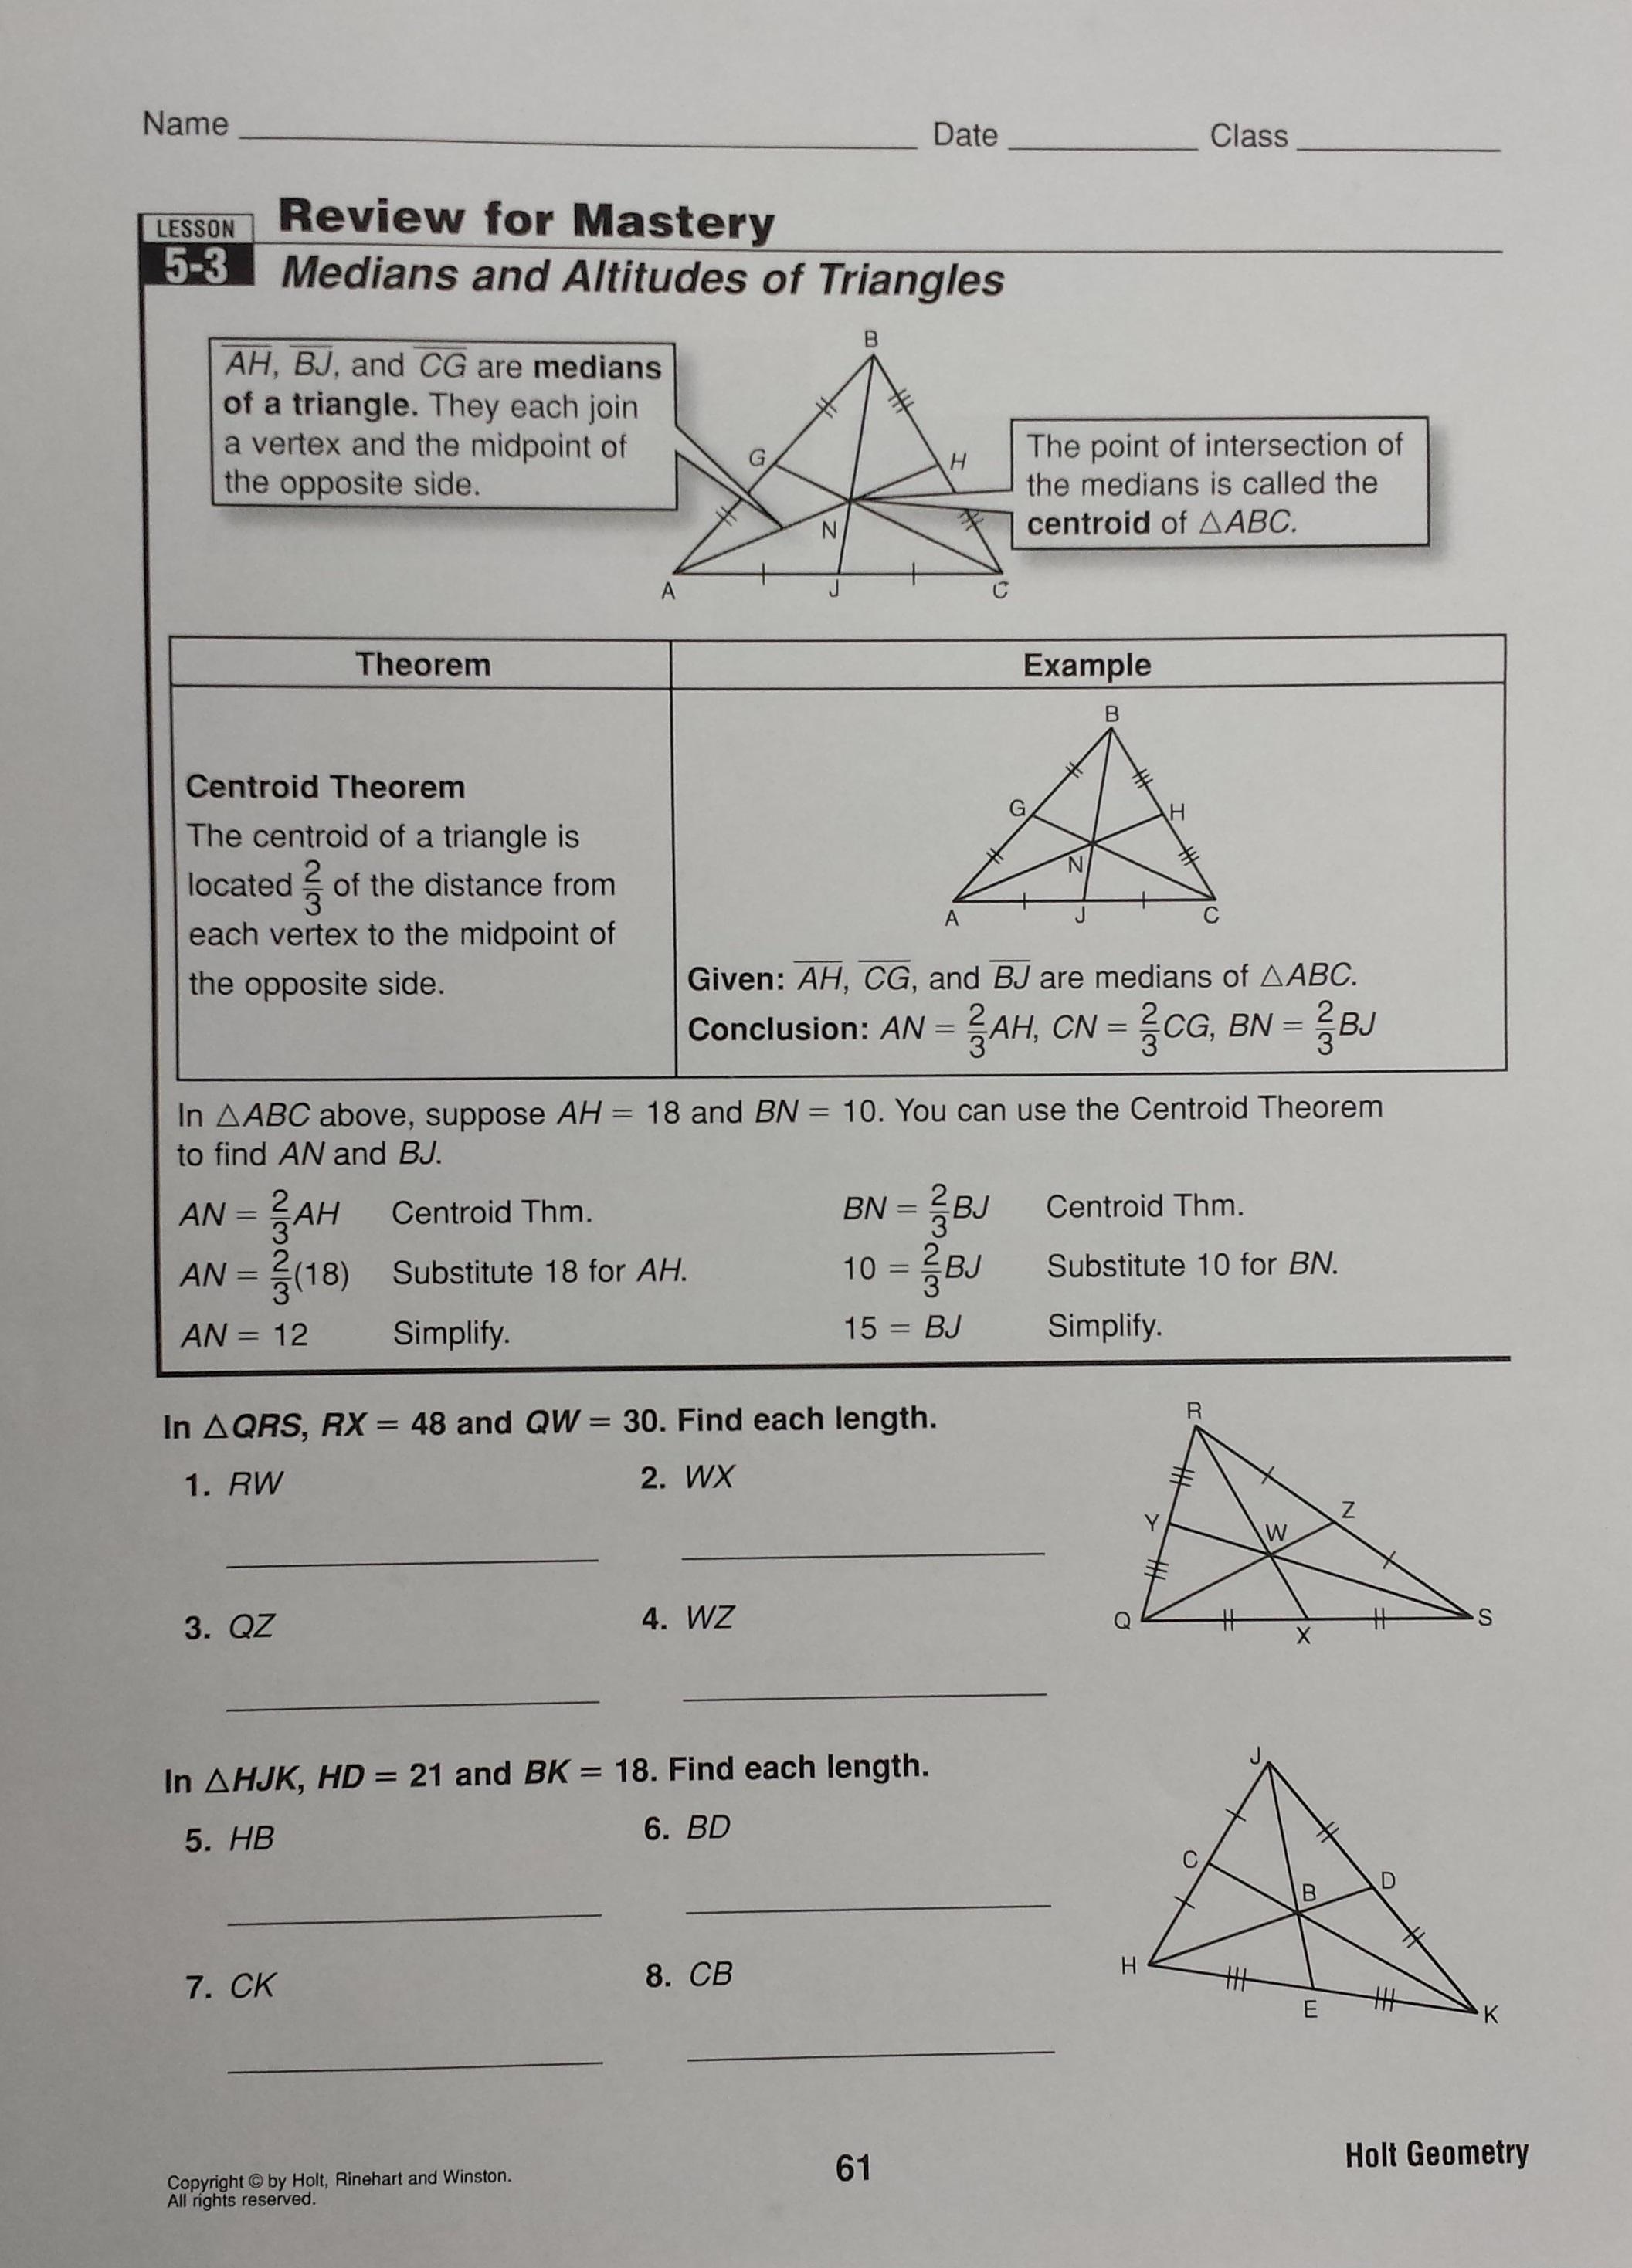 Homework Help And Answers Xyz